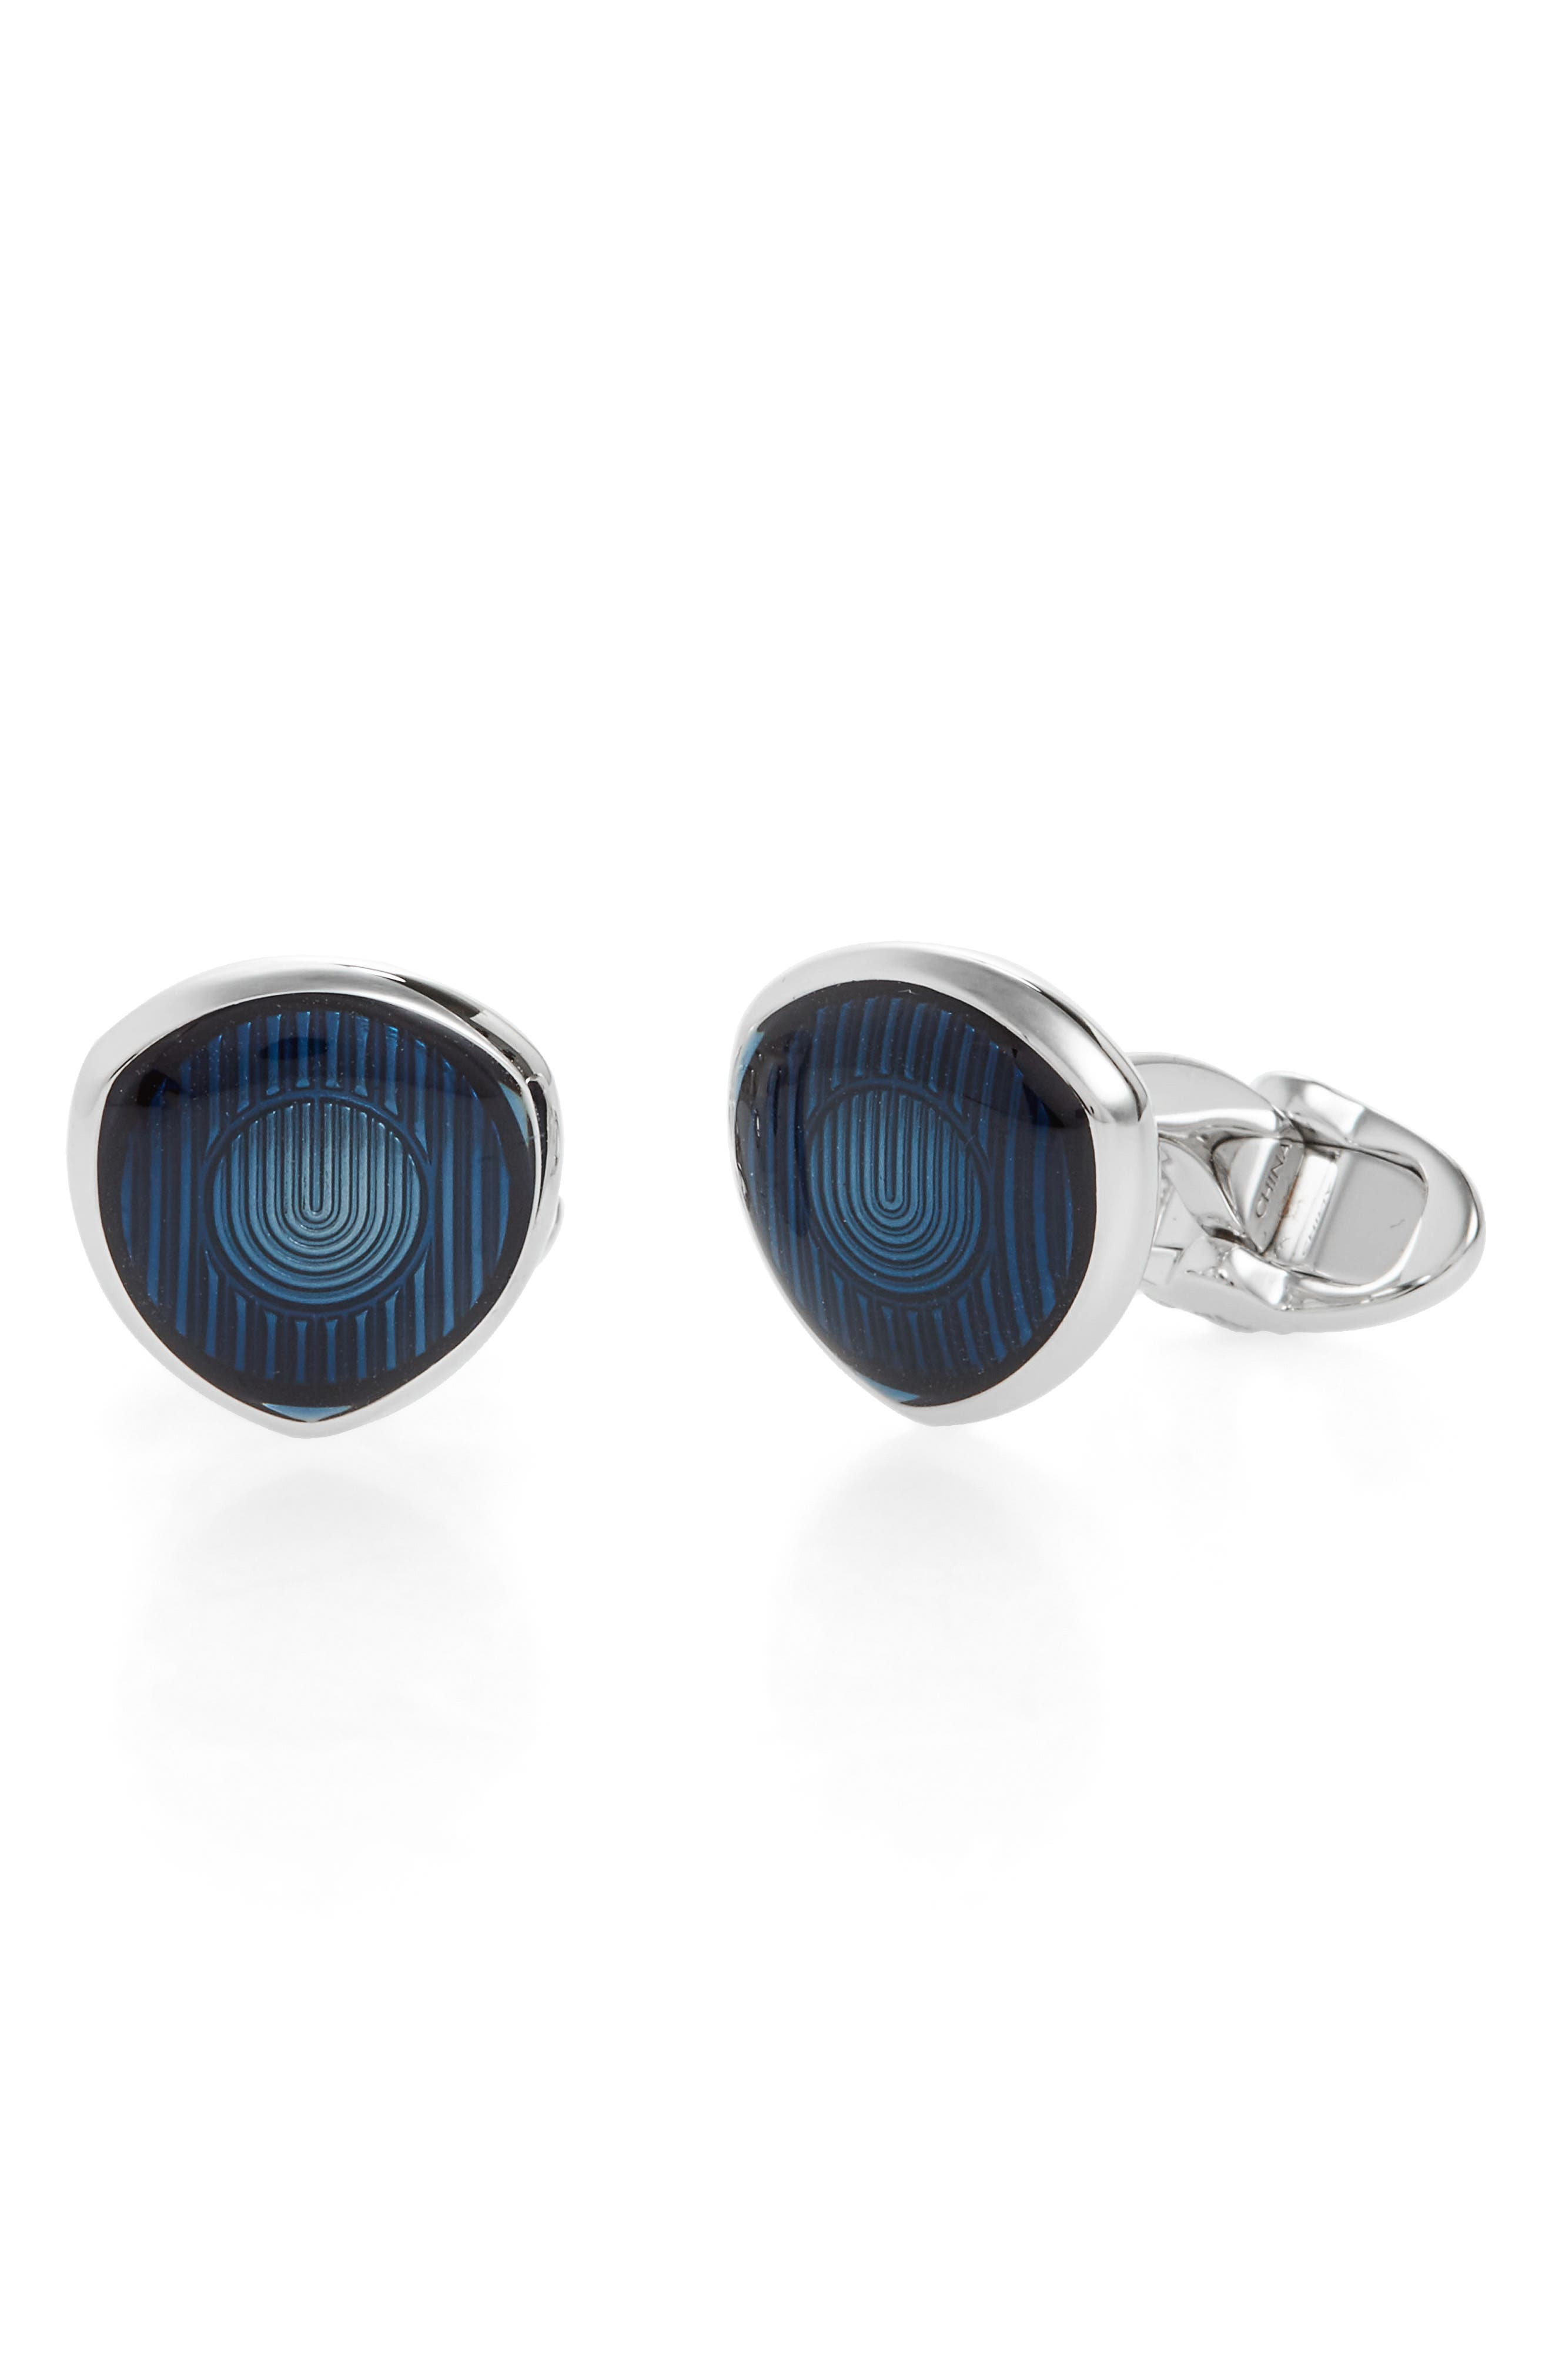 Headlamp Cuff Links,                         Main,                         color, Blue/Silver